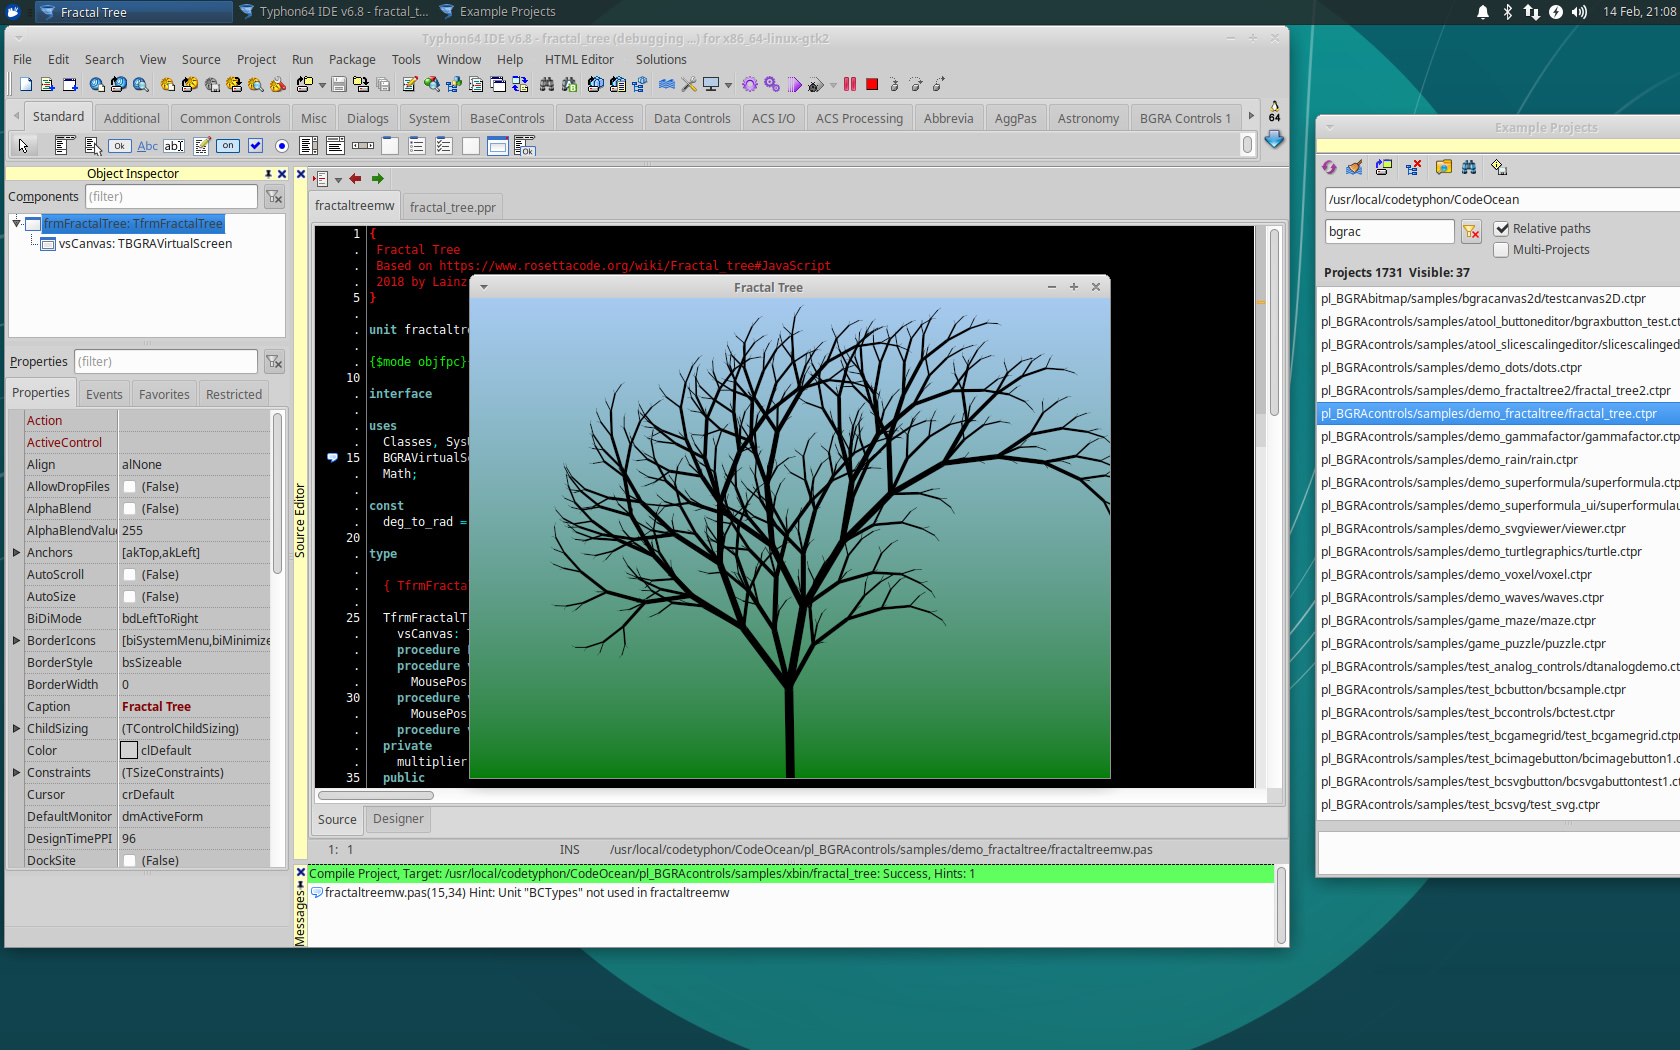 Xubuntu64-1804-2019-02-14-4_2019-02-14.jpg